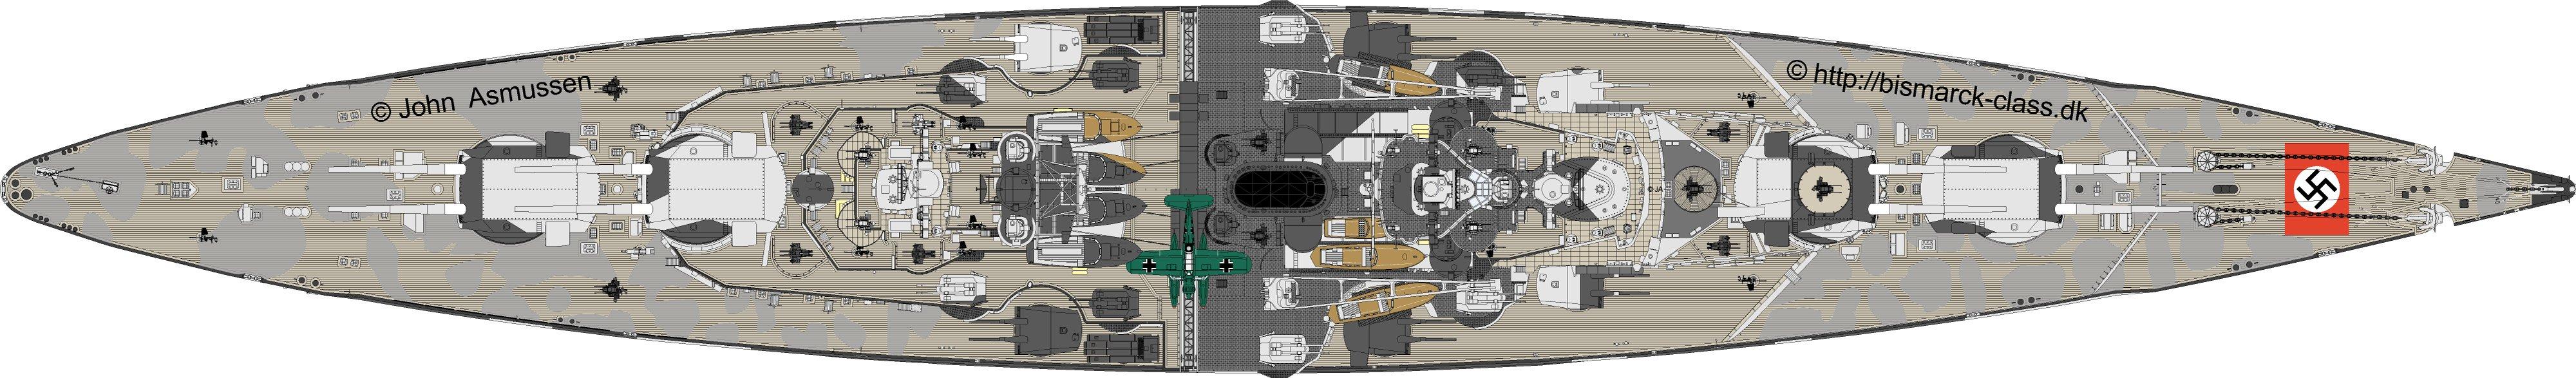 Tirpitz 1:350 Platinum Edition 18101912181923134915950529